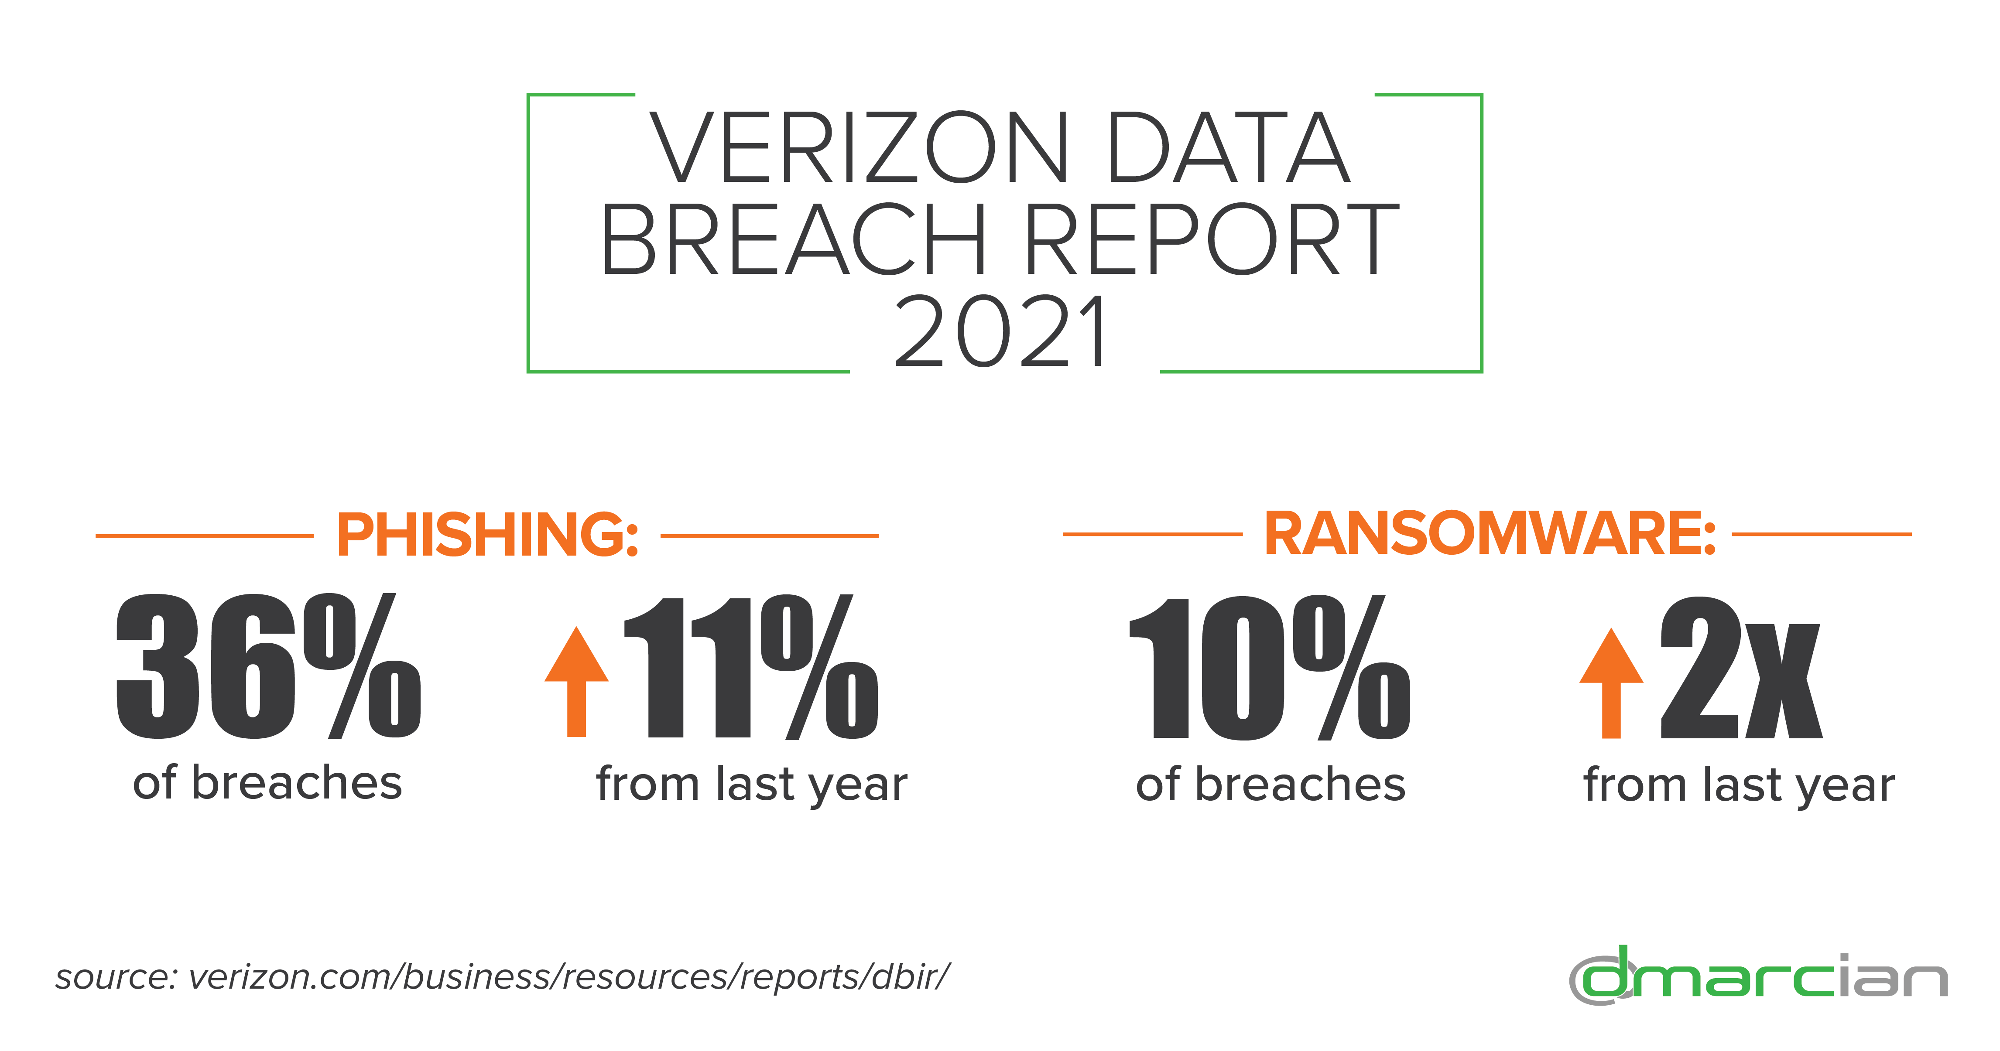 Verizon DBIR 2021 Graphic